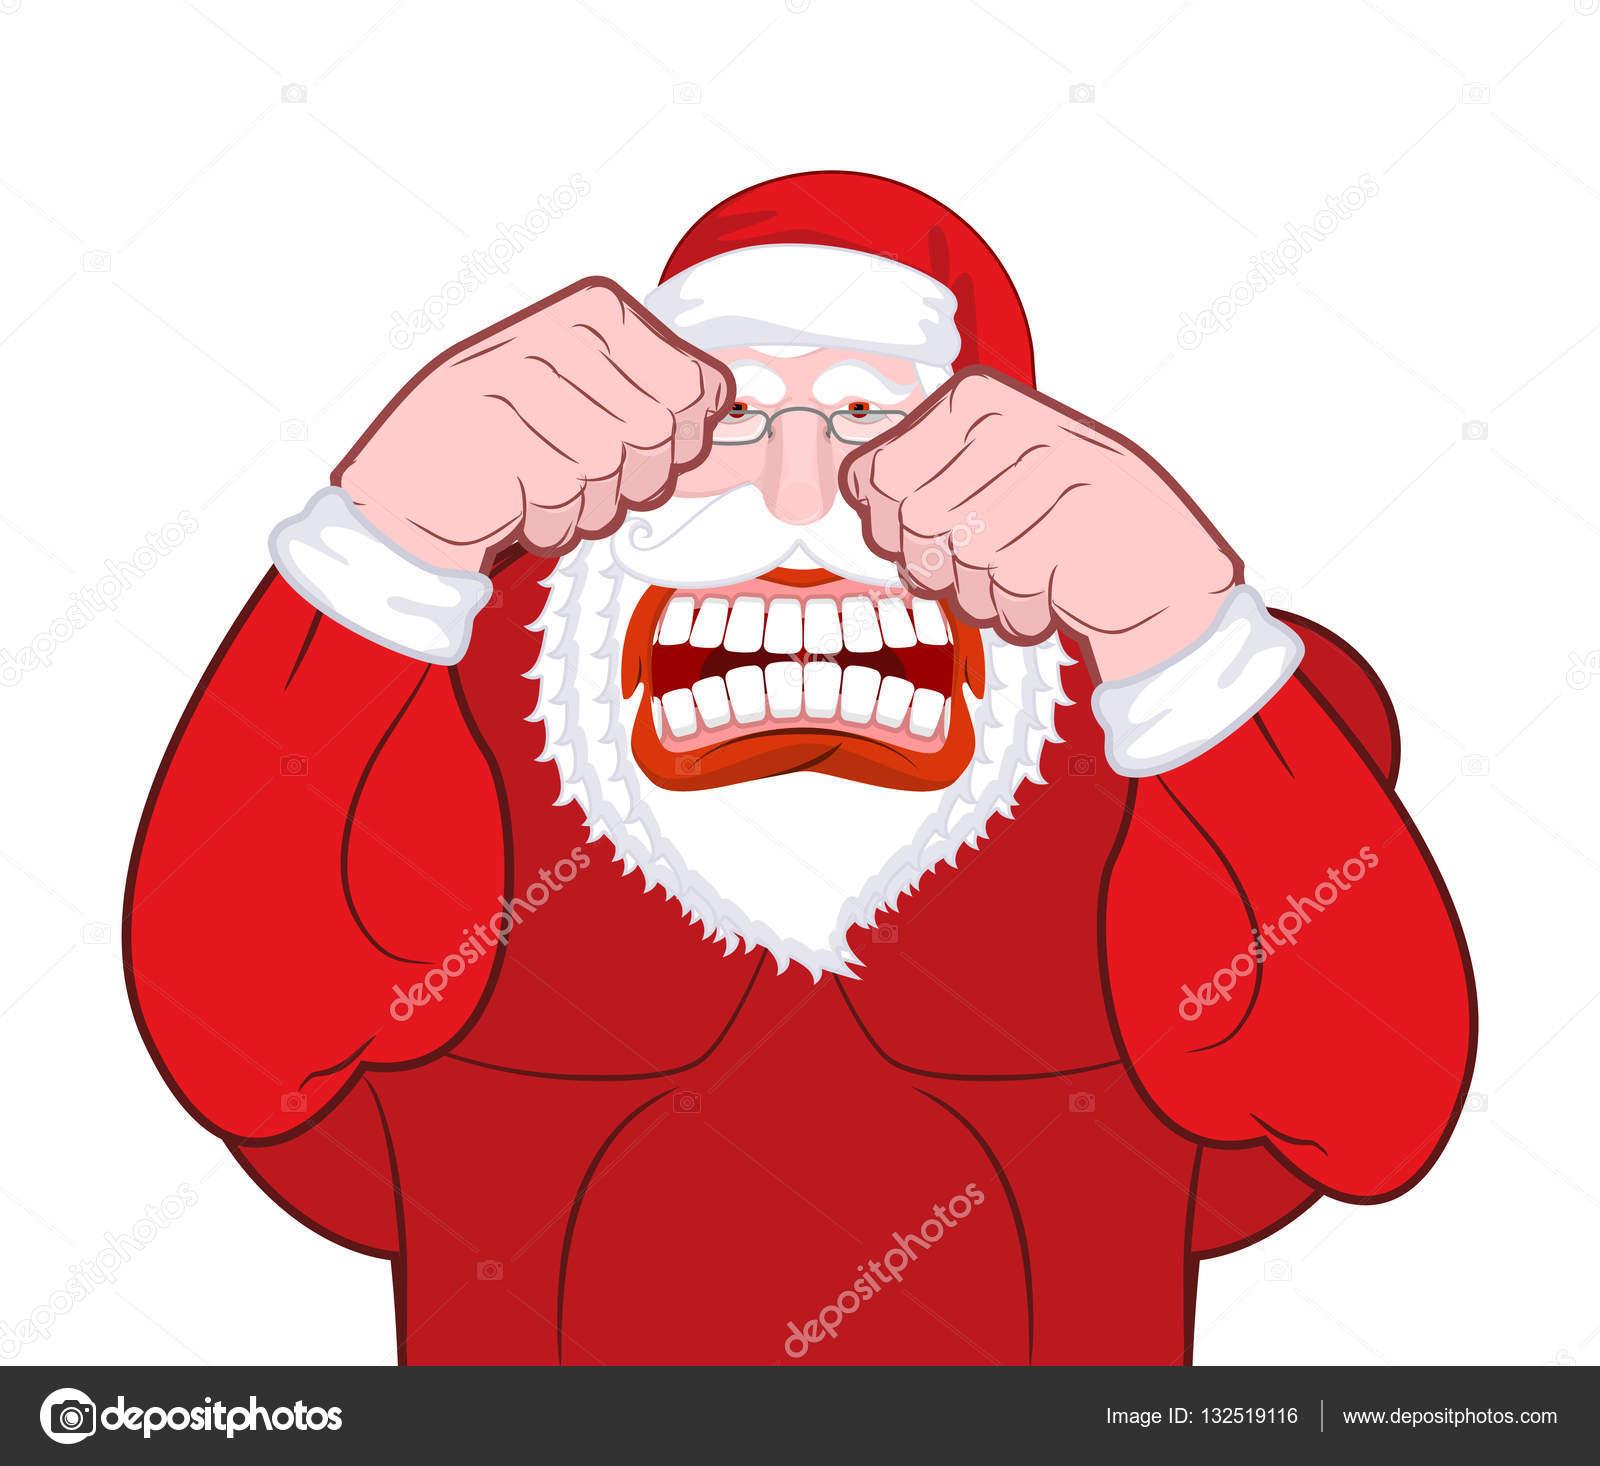 Lutas De Papai Noel Pai Natal Bate Os Punhos Knuckl Velho